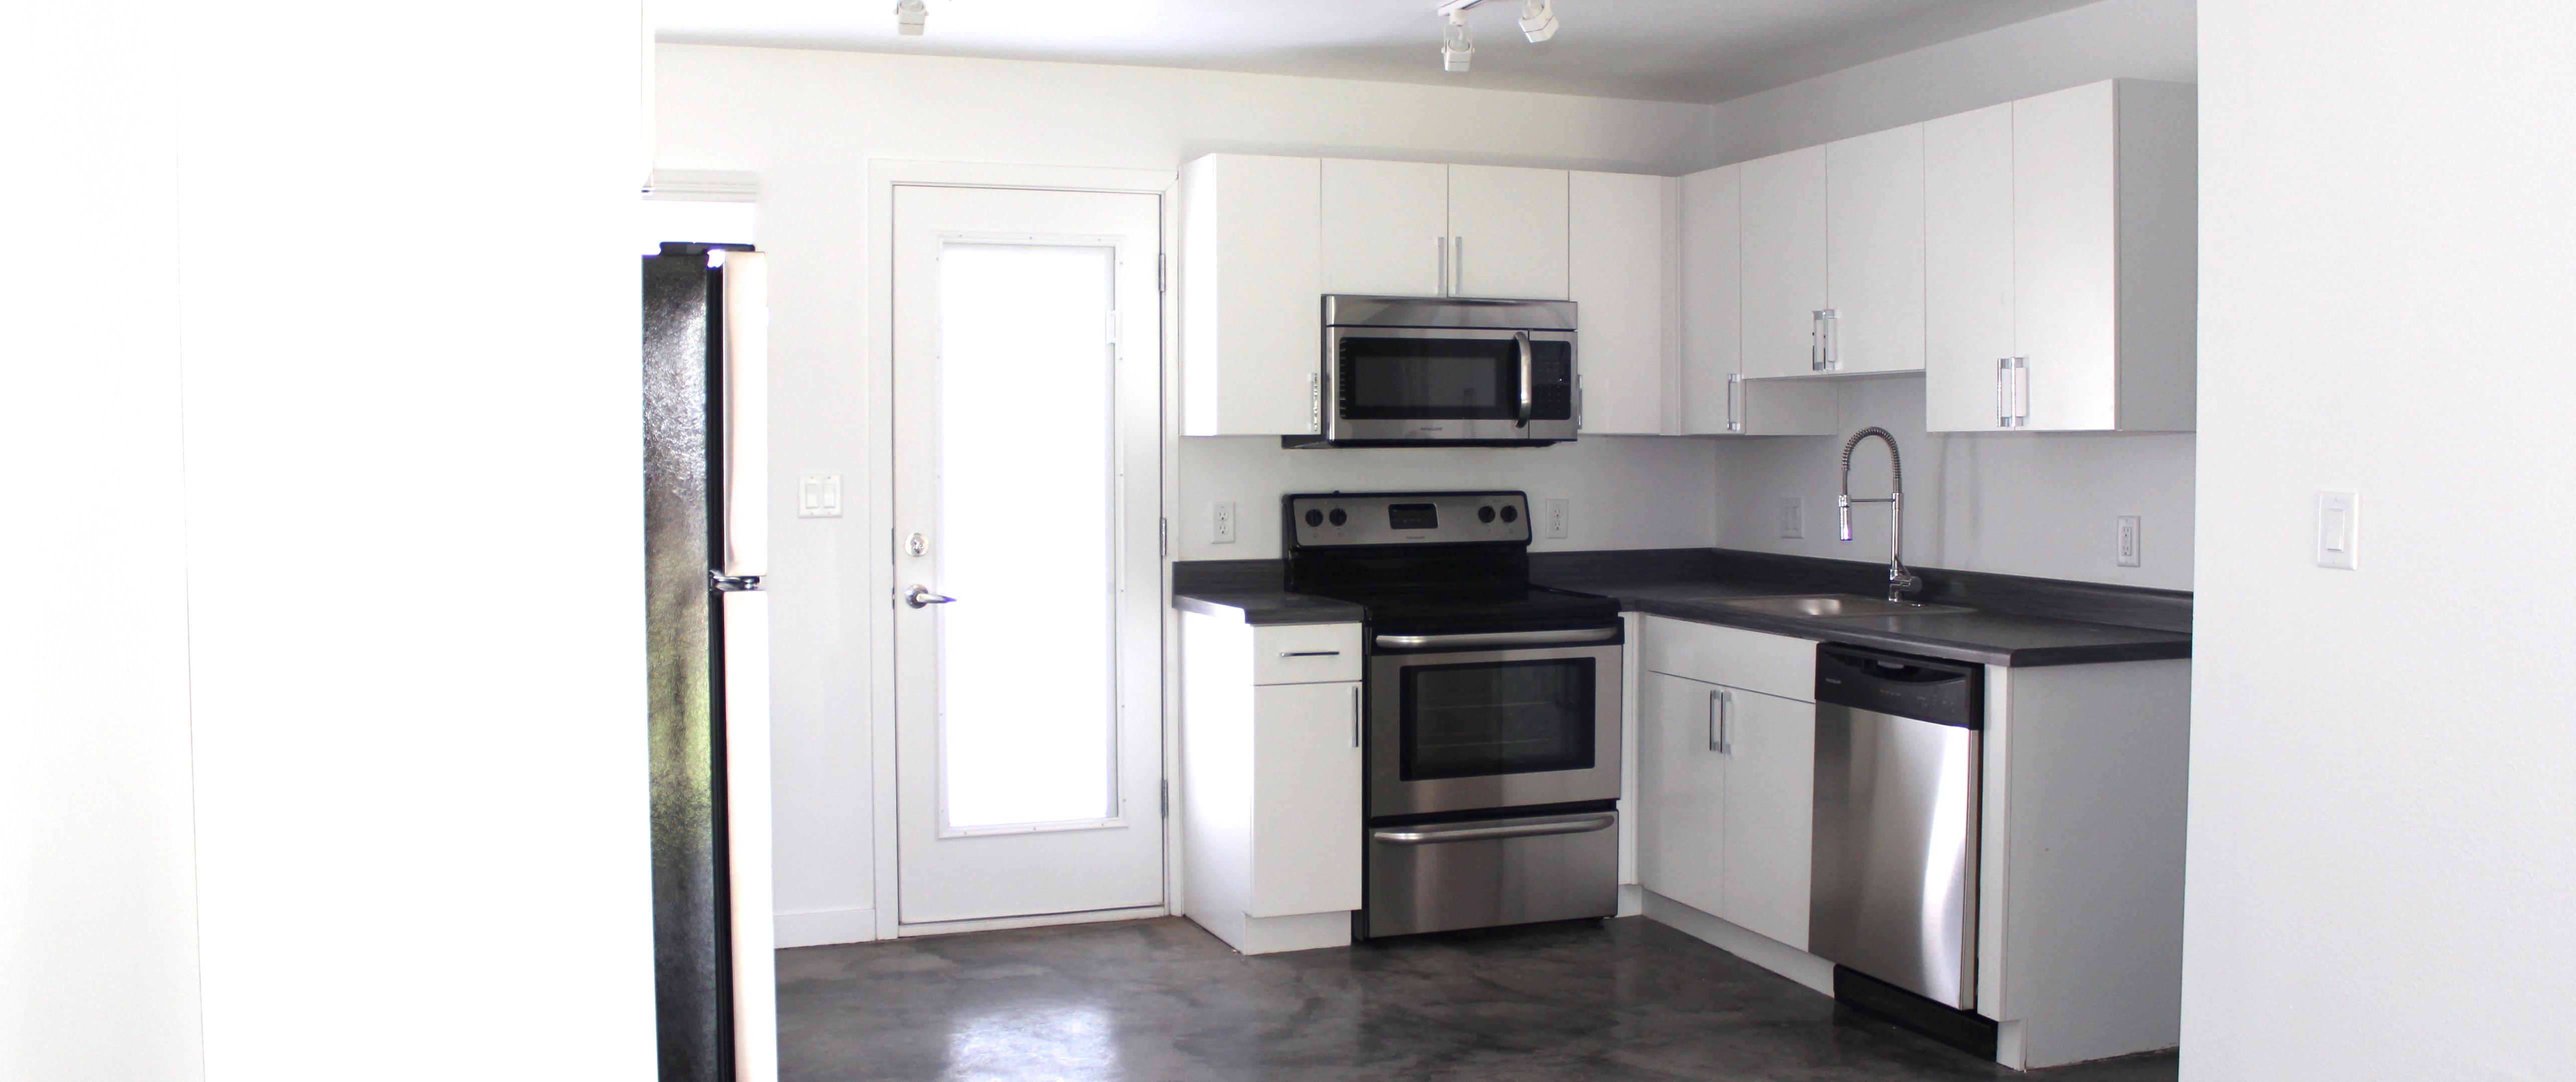 4140 N 10th St, Phoenix, AZ 85014 | Midtown Phoenix Apartments For Rent